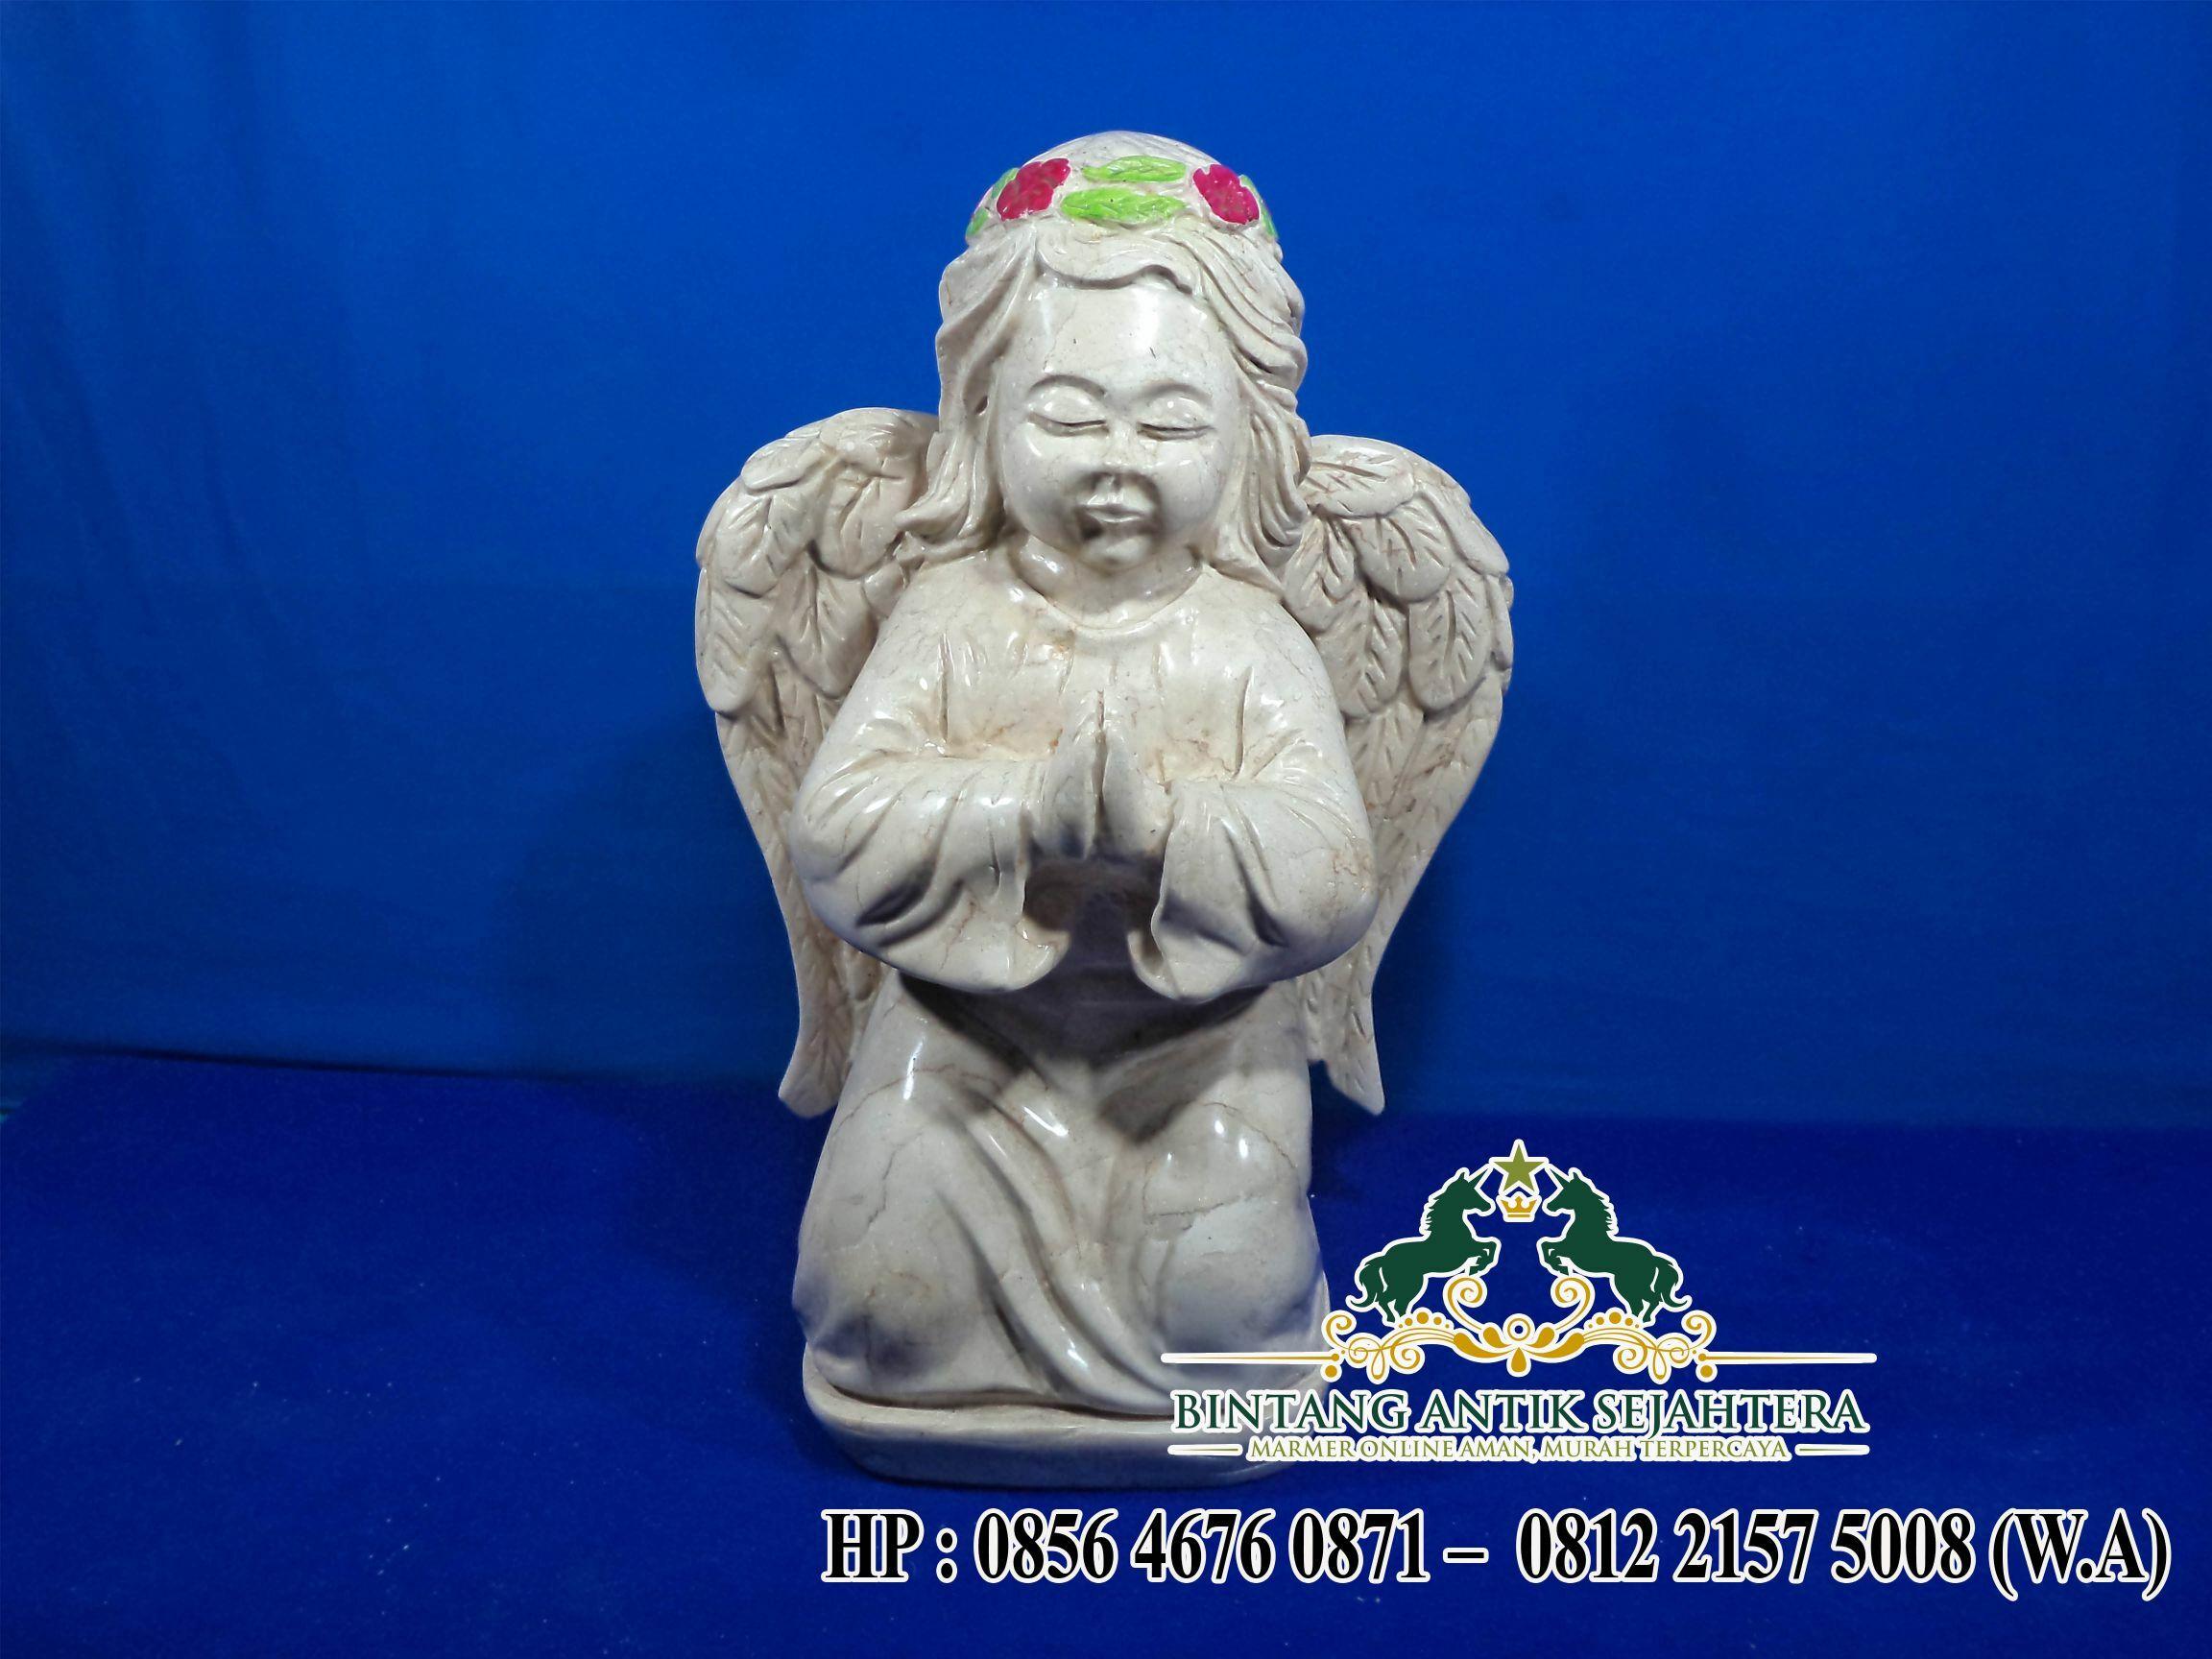 Jual Patung Malaikat